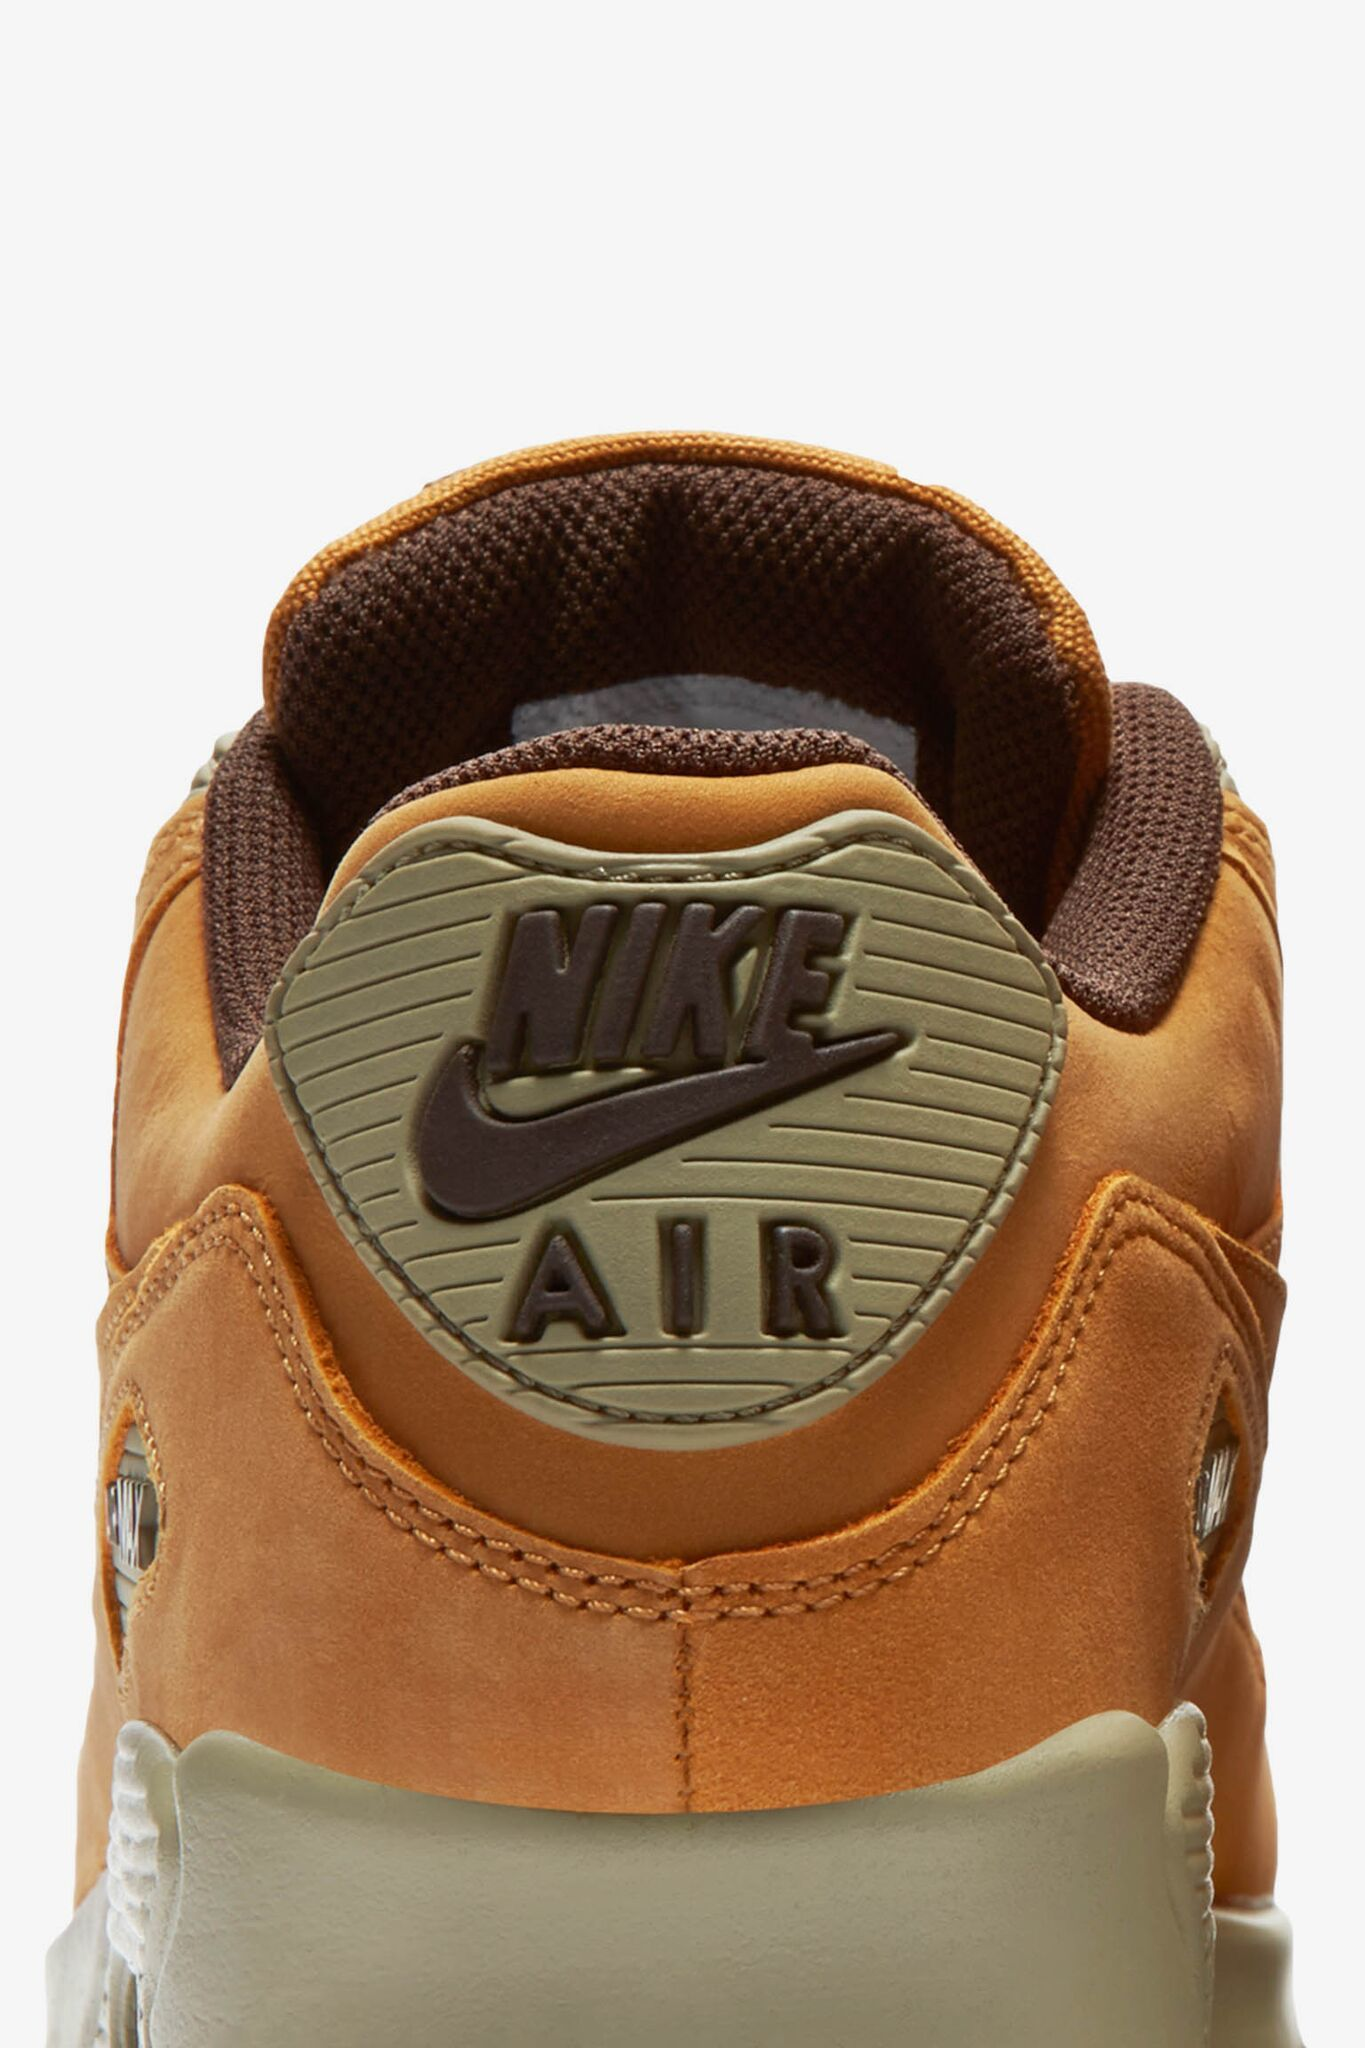 Women's Nike Air Max 90 Winter 'Bronze & Bamboo'. Release Date